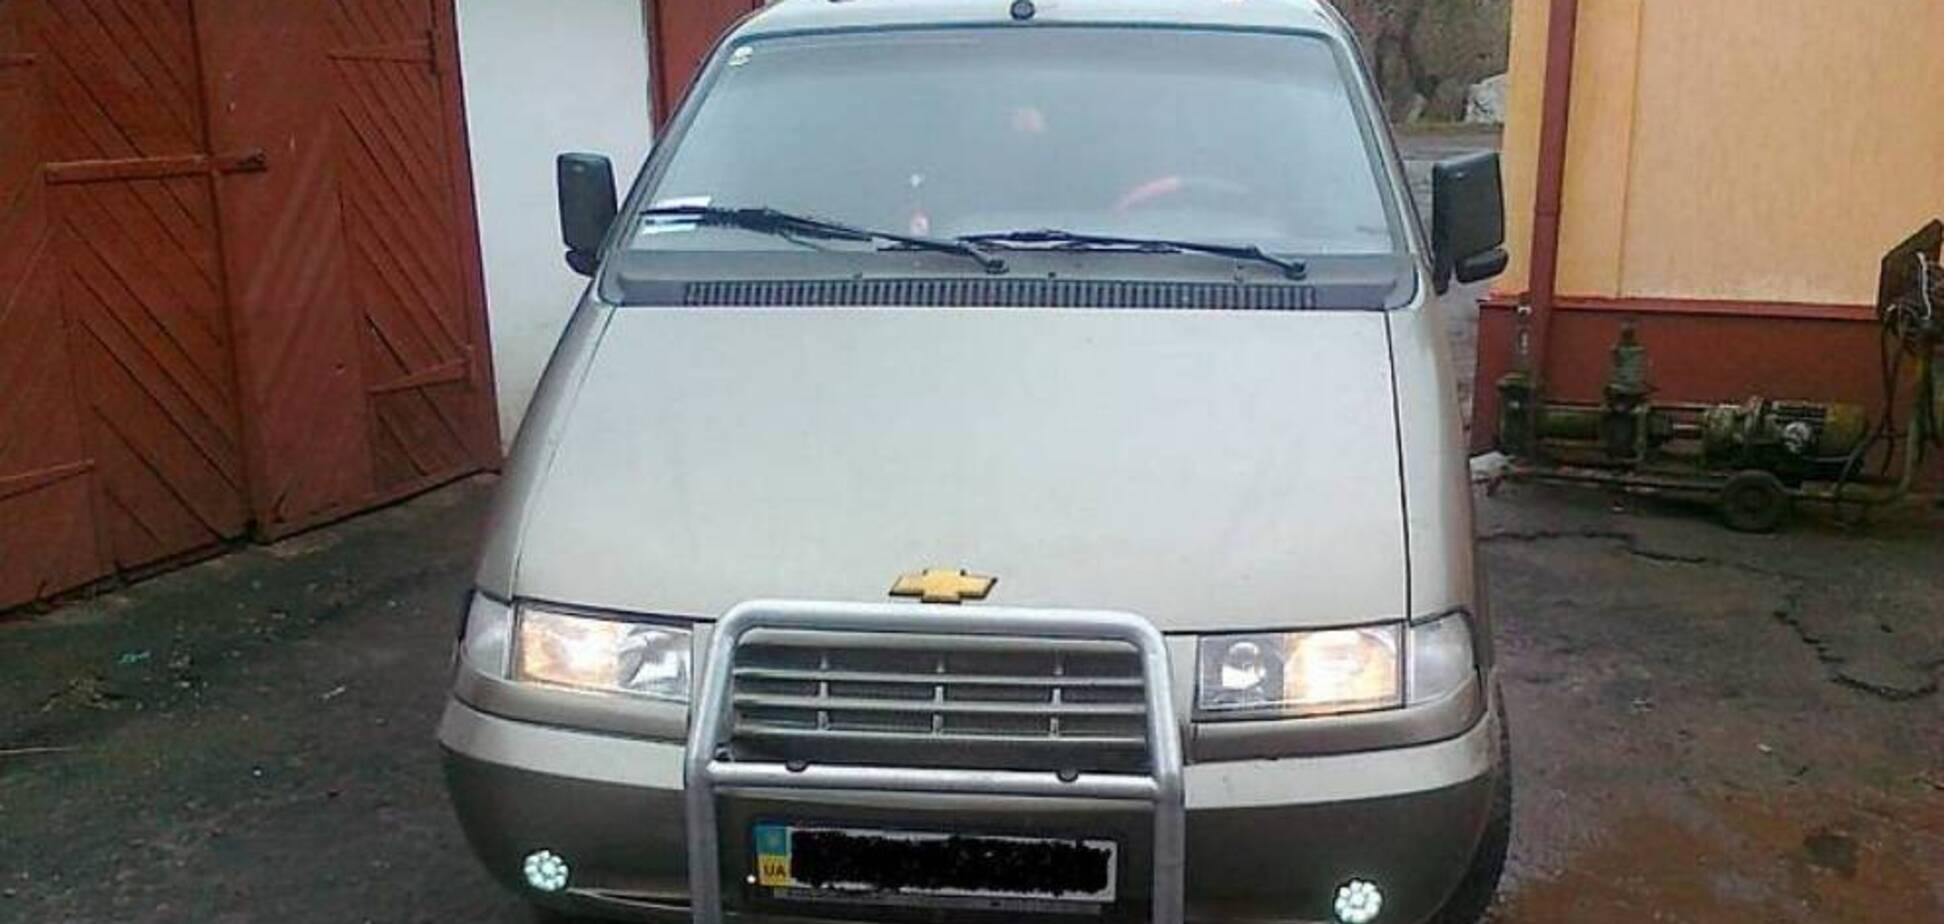 На б/у внедорожнике эмблема Chevrolet, но это на самом деле Лада. Фото: auto.ria.ua